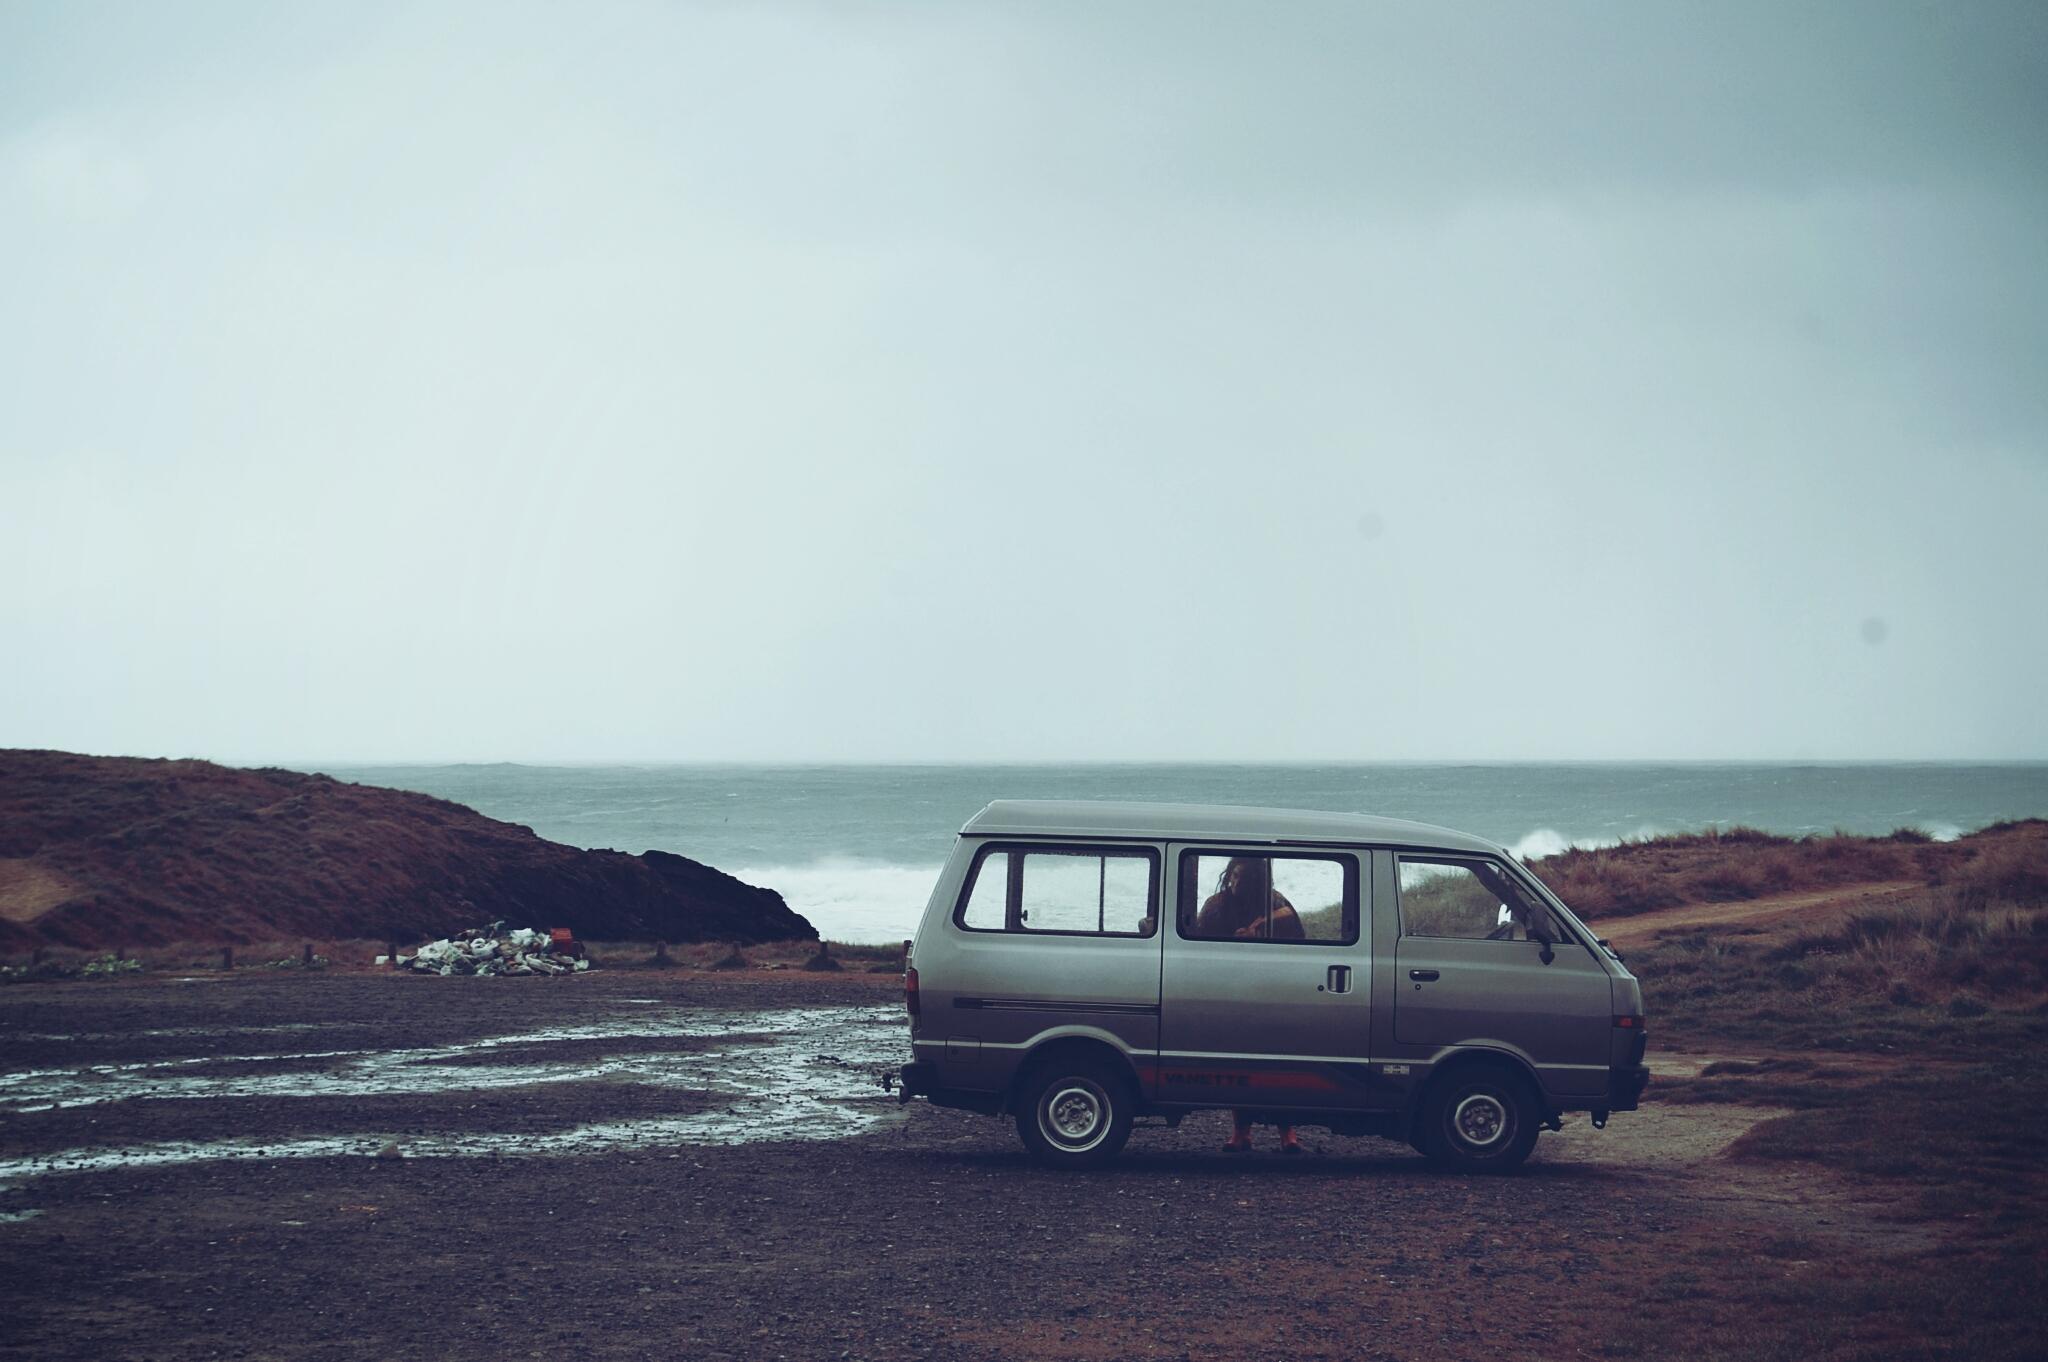 Life-of-Pix-free-stock-photos-van-sea-landscape-santalla.jpg